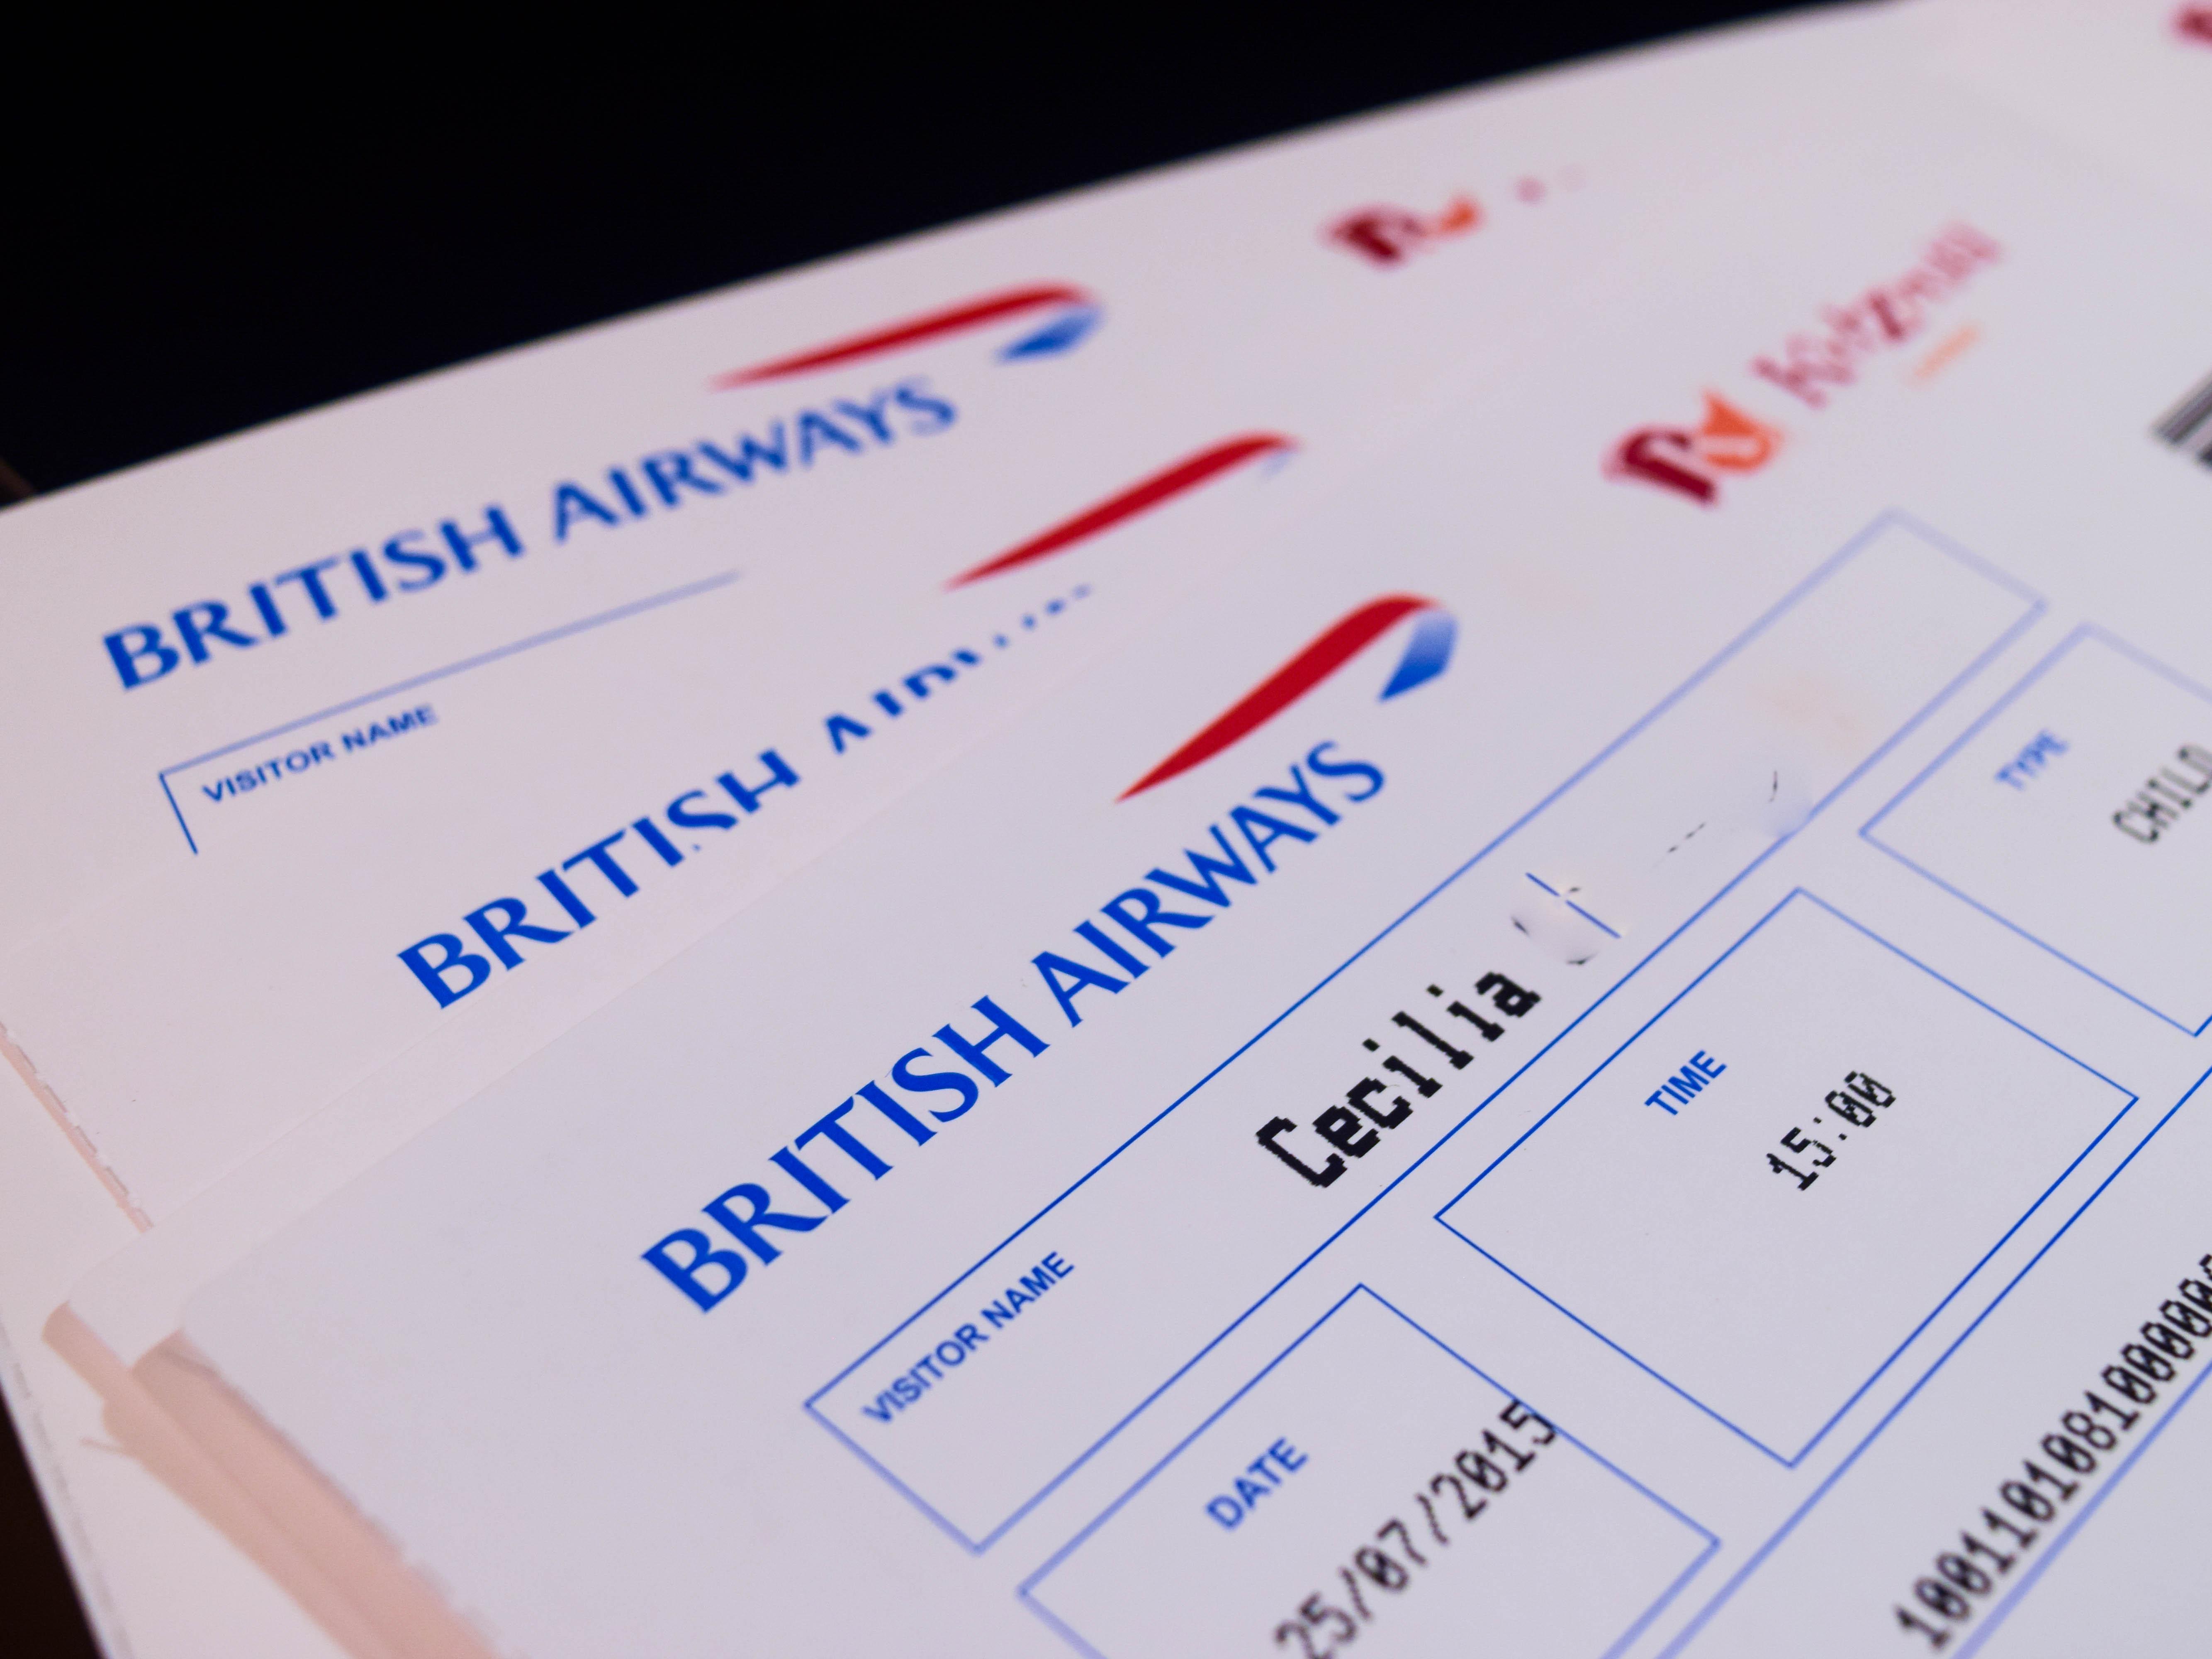 Kidzania London Ticket